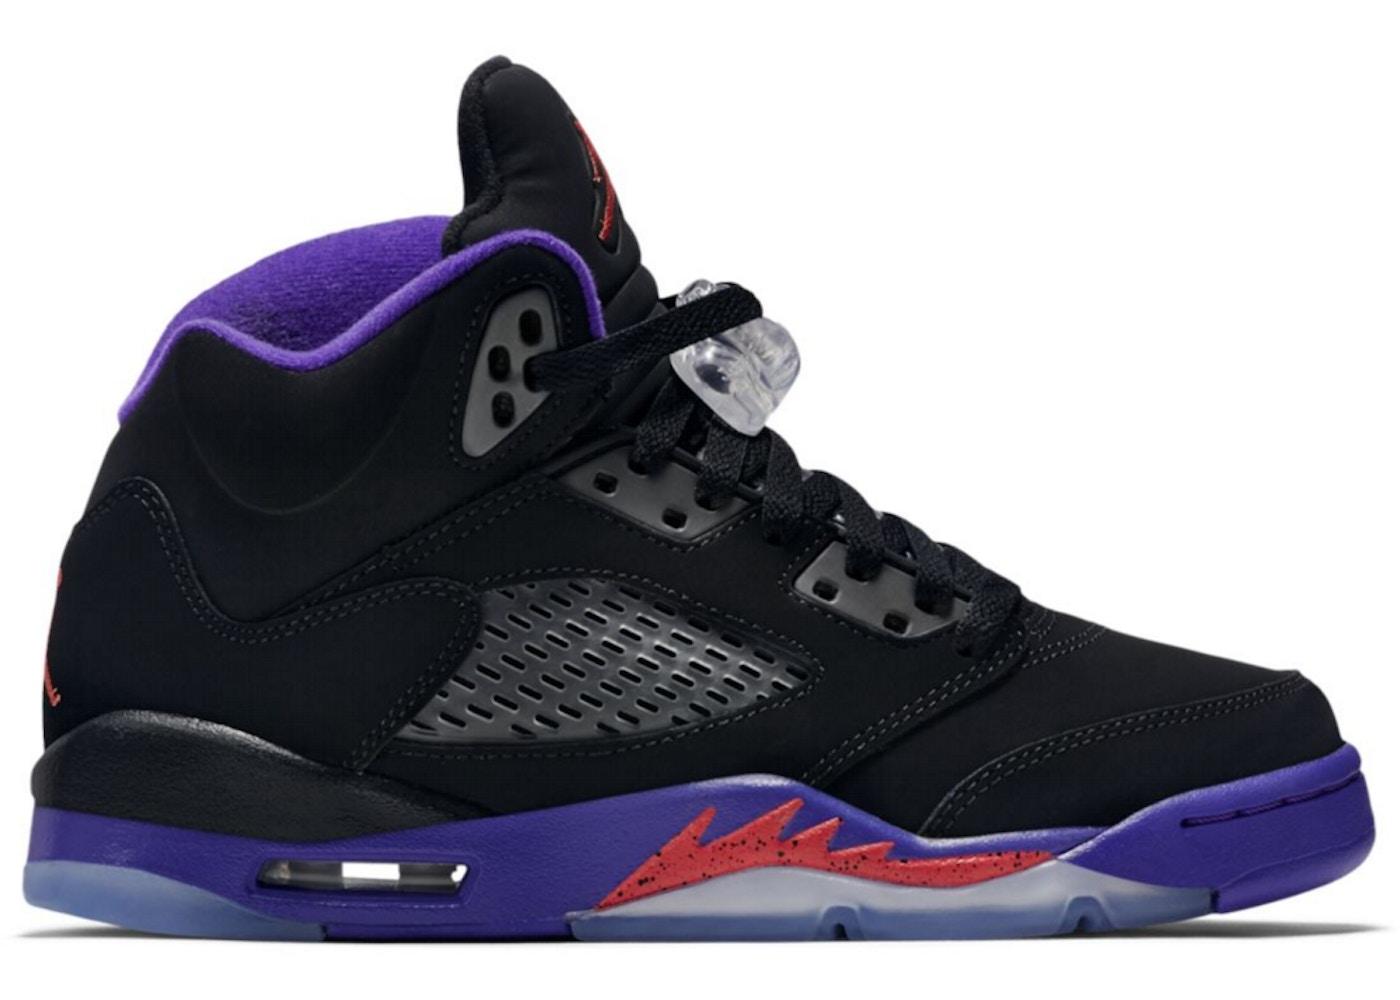 brand new 97e0f 3a87c Jordan 5 Retro Fierce Purple (GS)